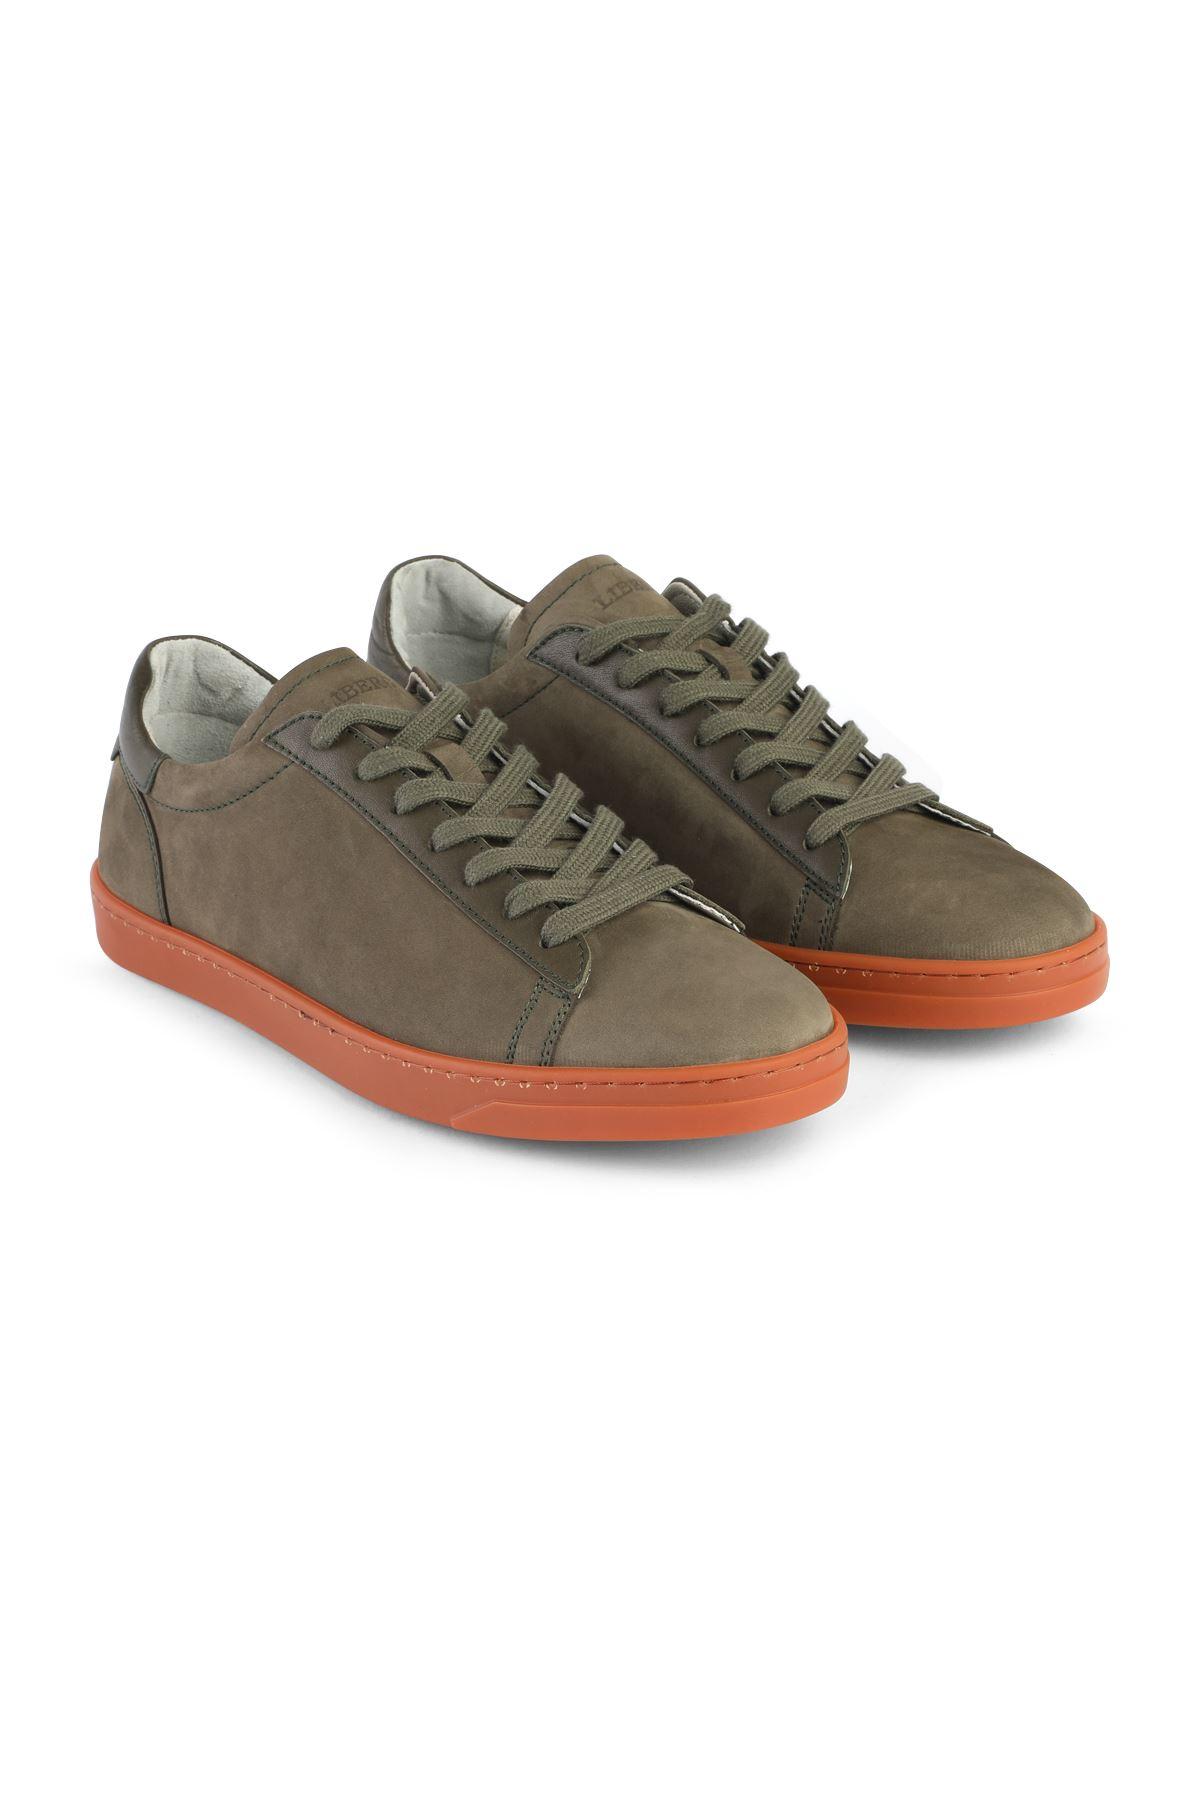 Libero 3419 Haki Casual Ayakkabı